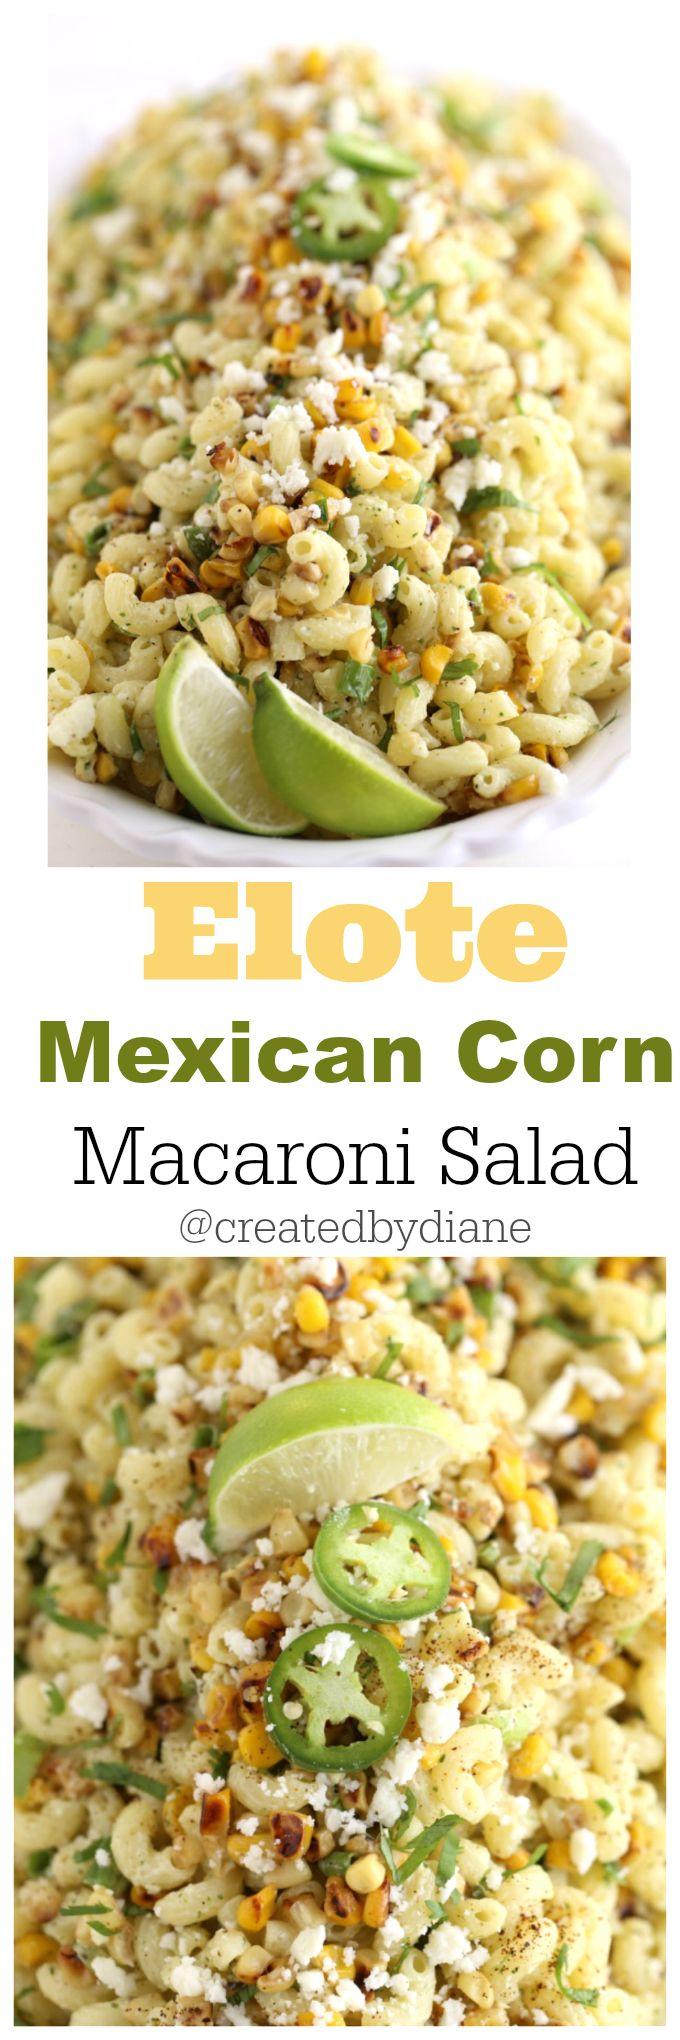 Mexican Macaroni Salad @createdbydiane